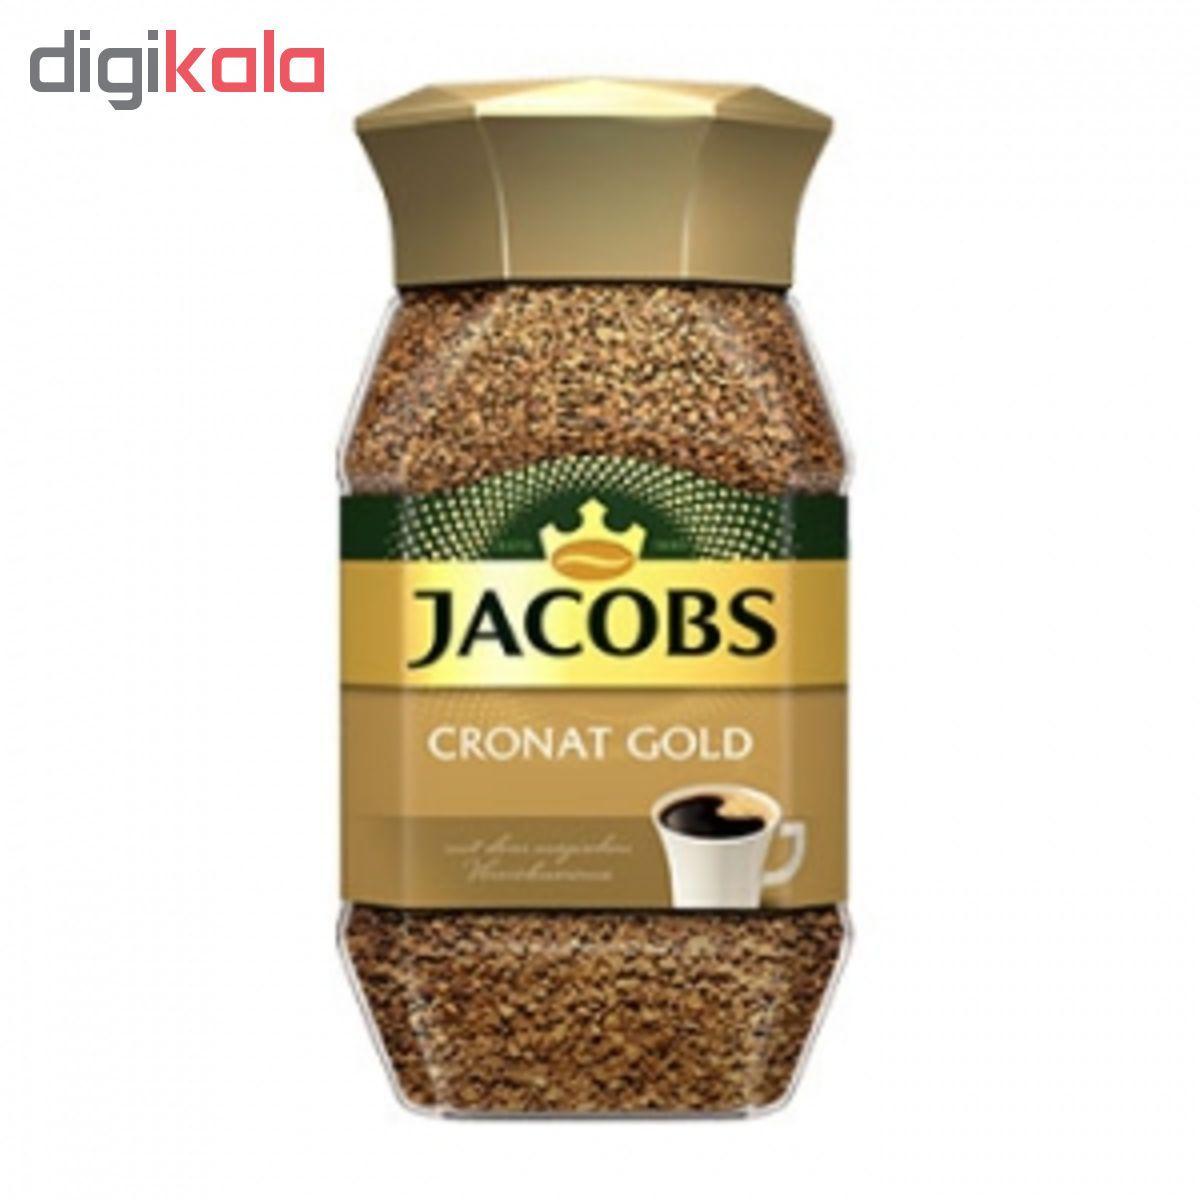 قهوه فوری جاکوبز مدل Cronat Gold مقدار 200 گرم main 1 1